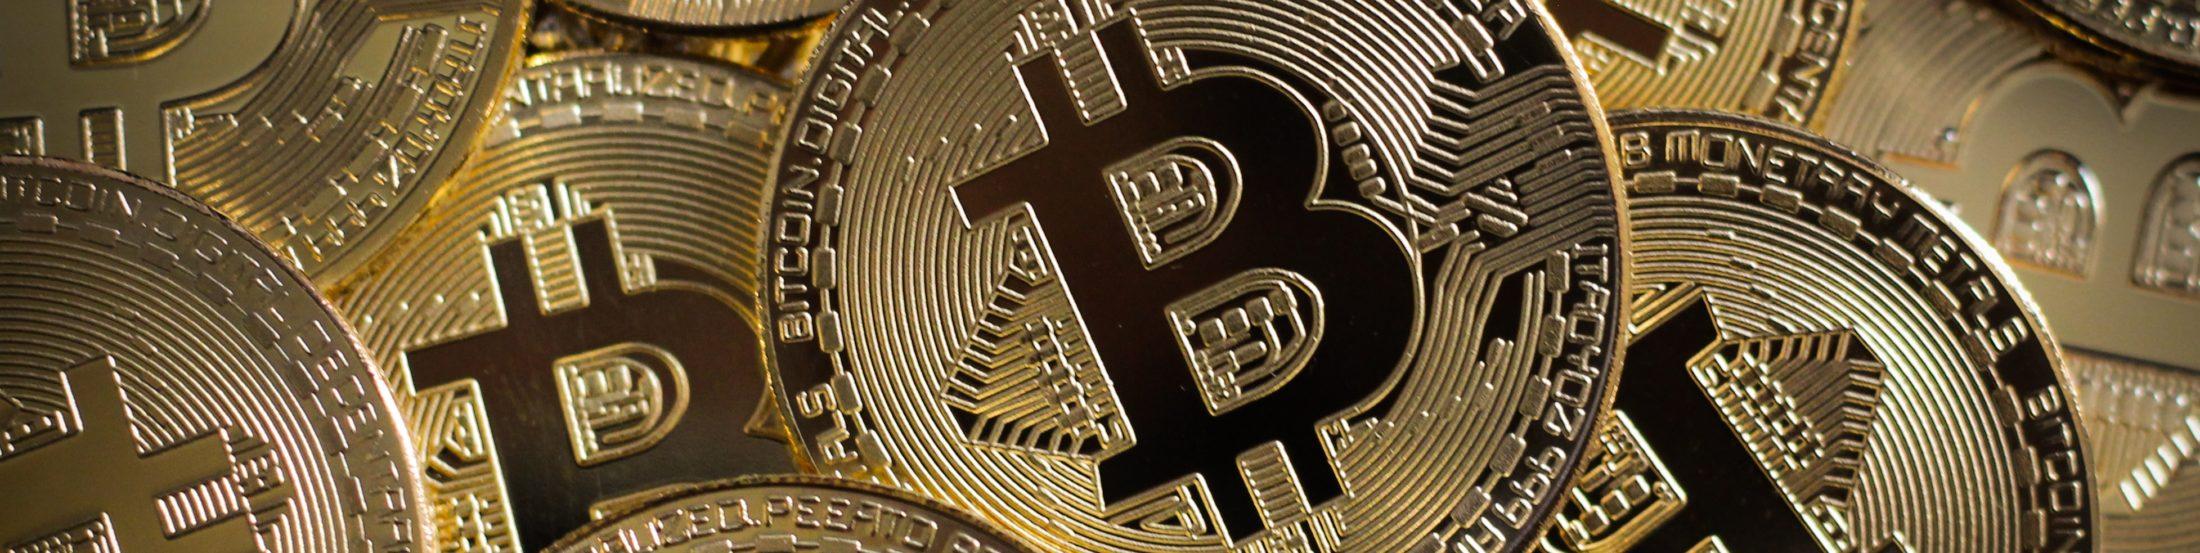 Cape Town Bitcoin